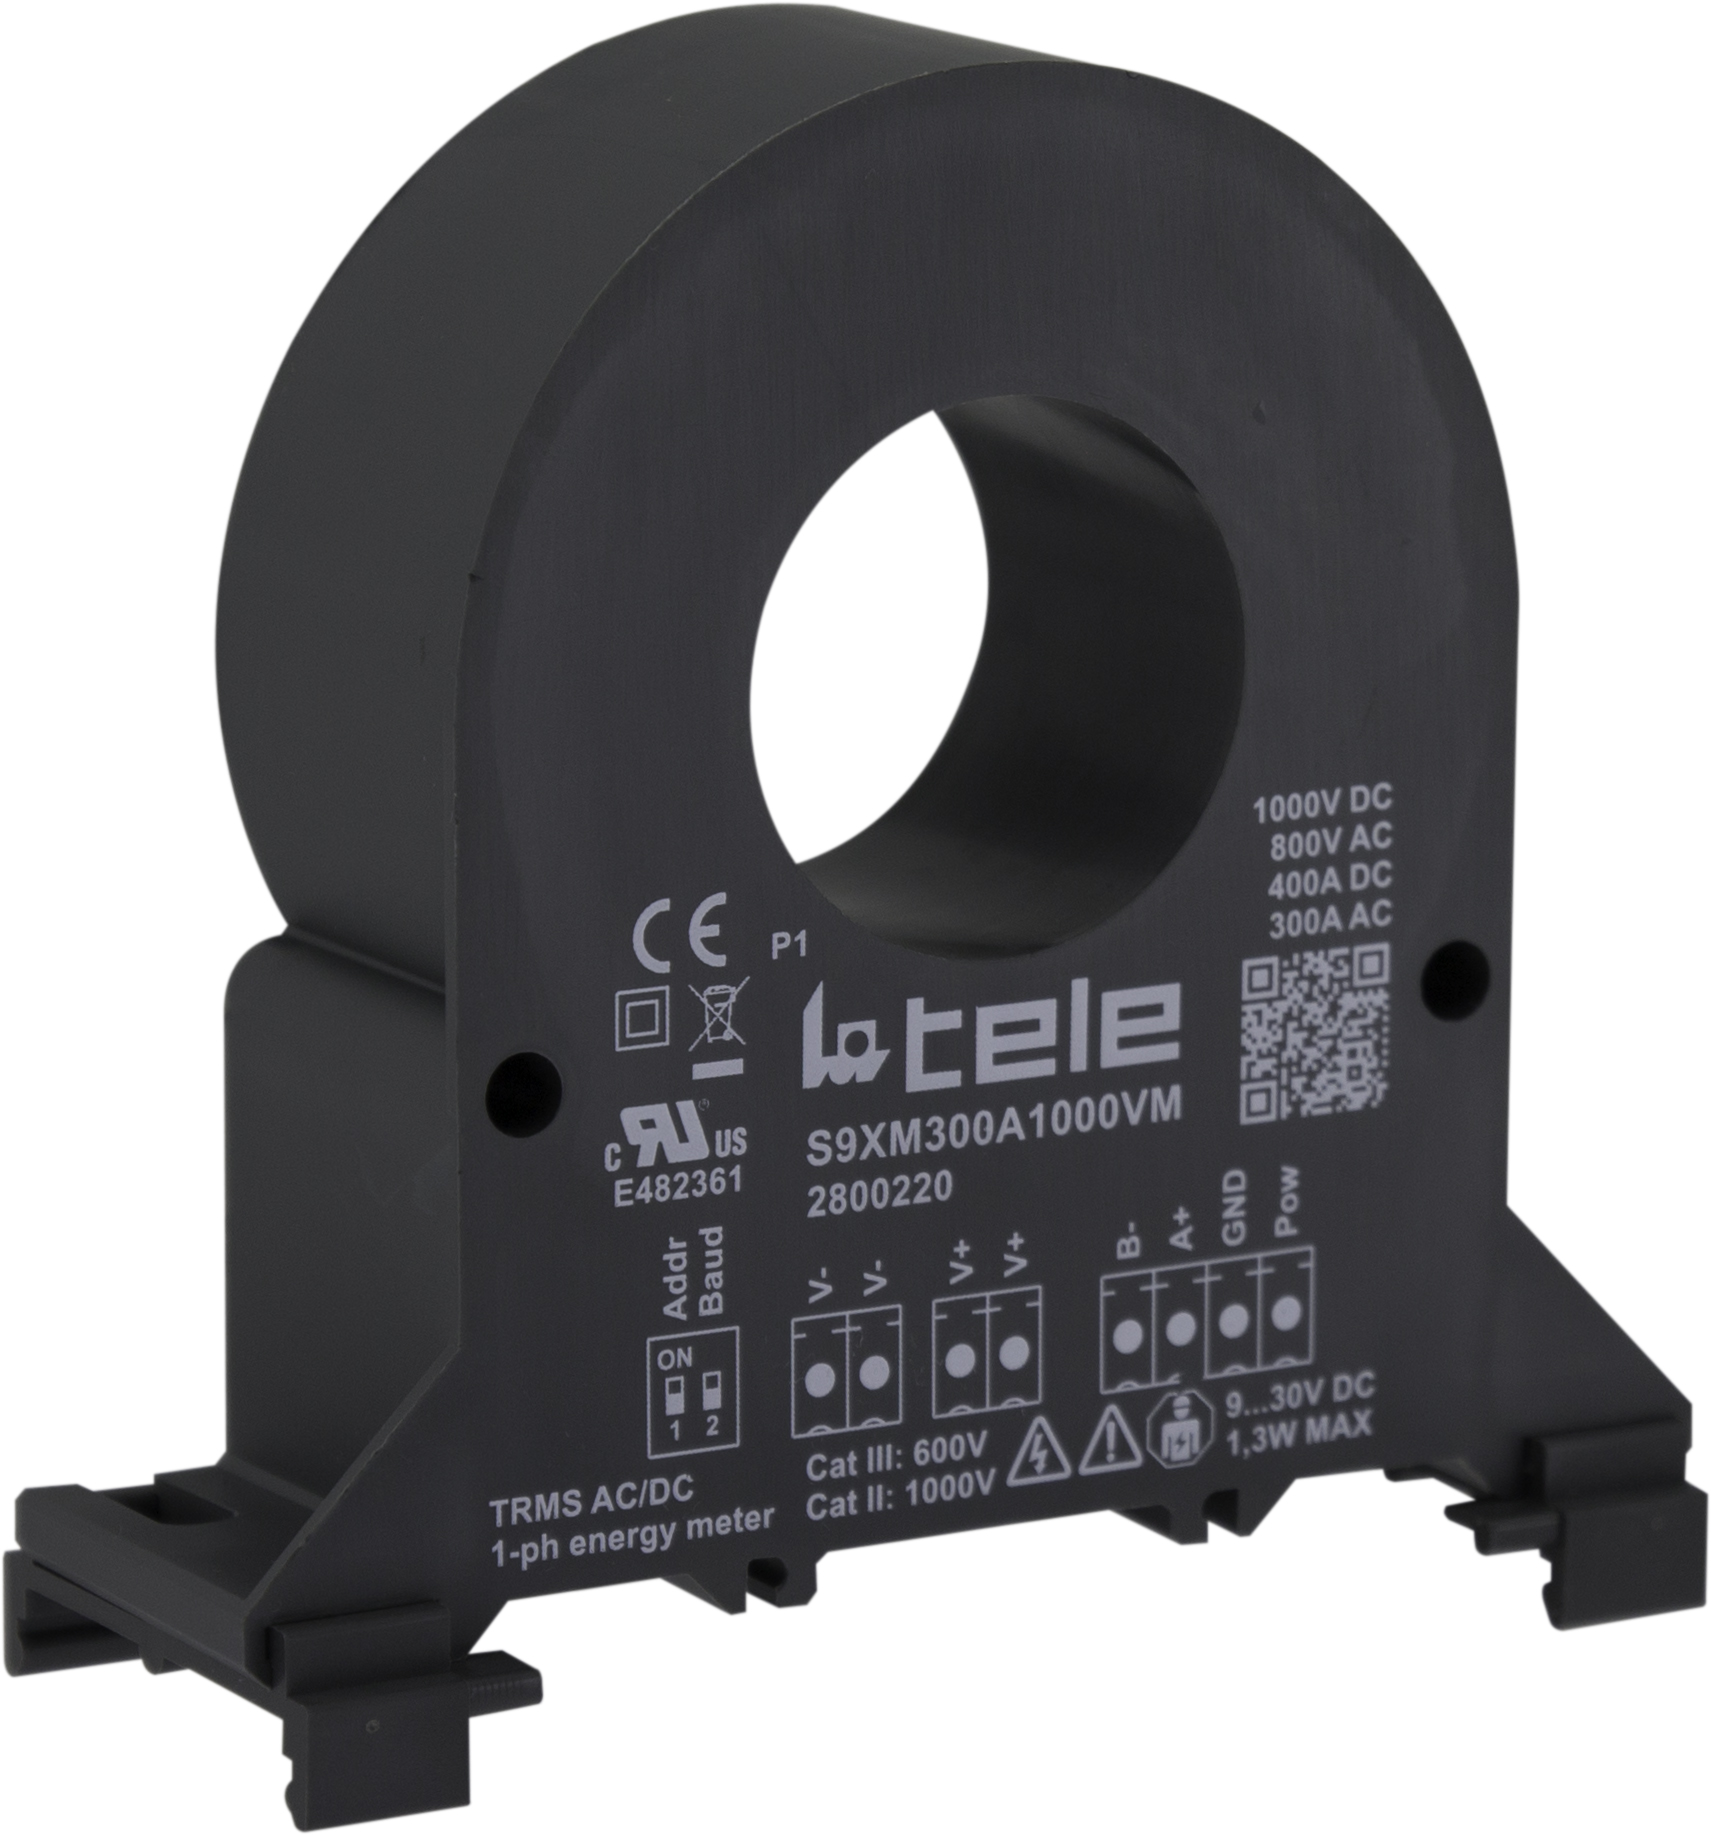 Tele -CT_S9XM300A1000VM_2800220